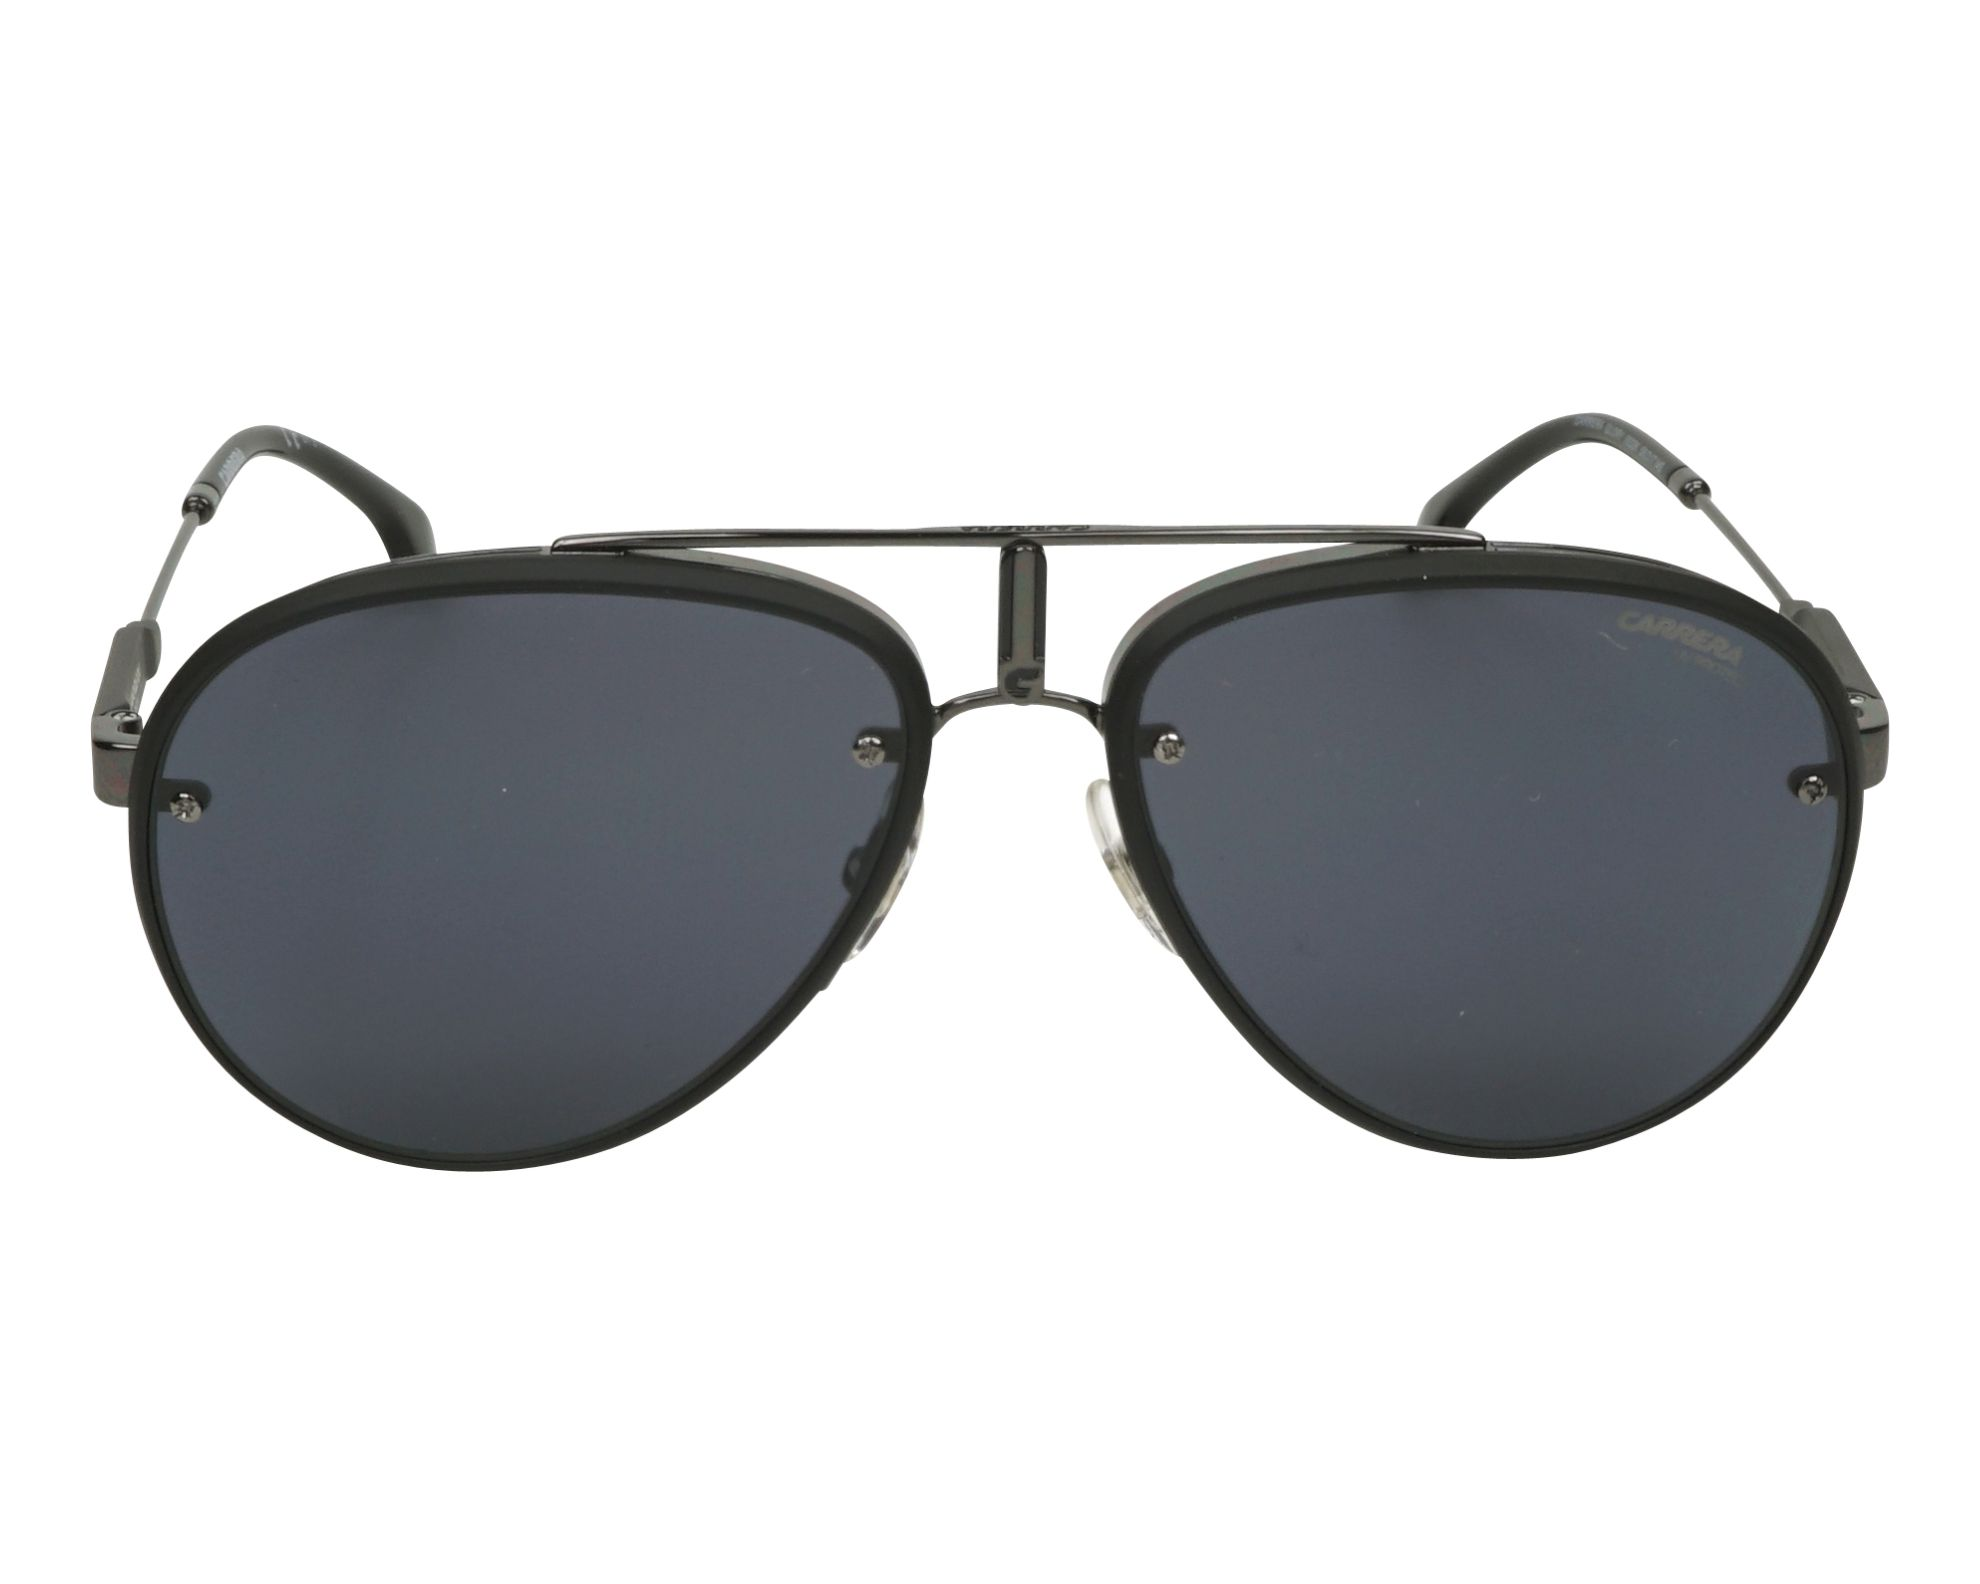 d0f4410e1a Sunglasses Carrera GLORY 003 2K 58-17 Black Gun front view